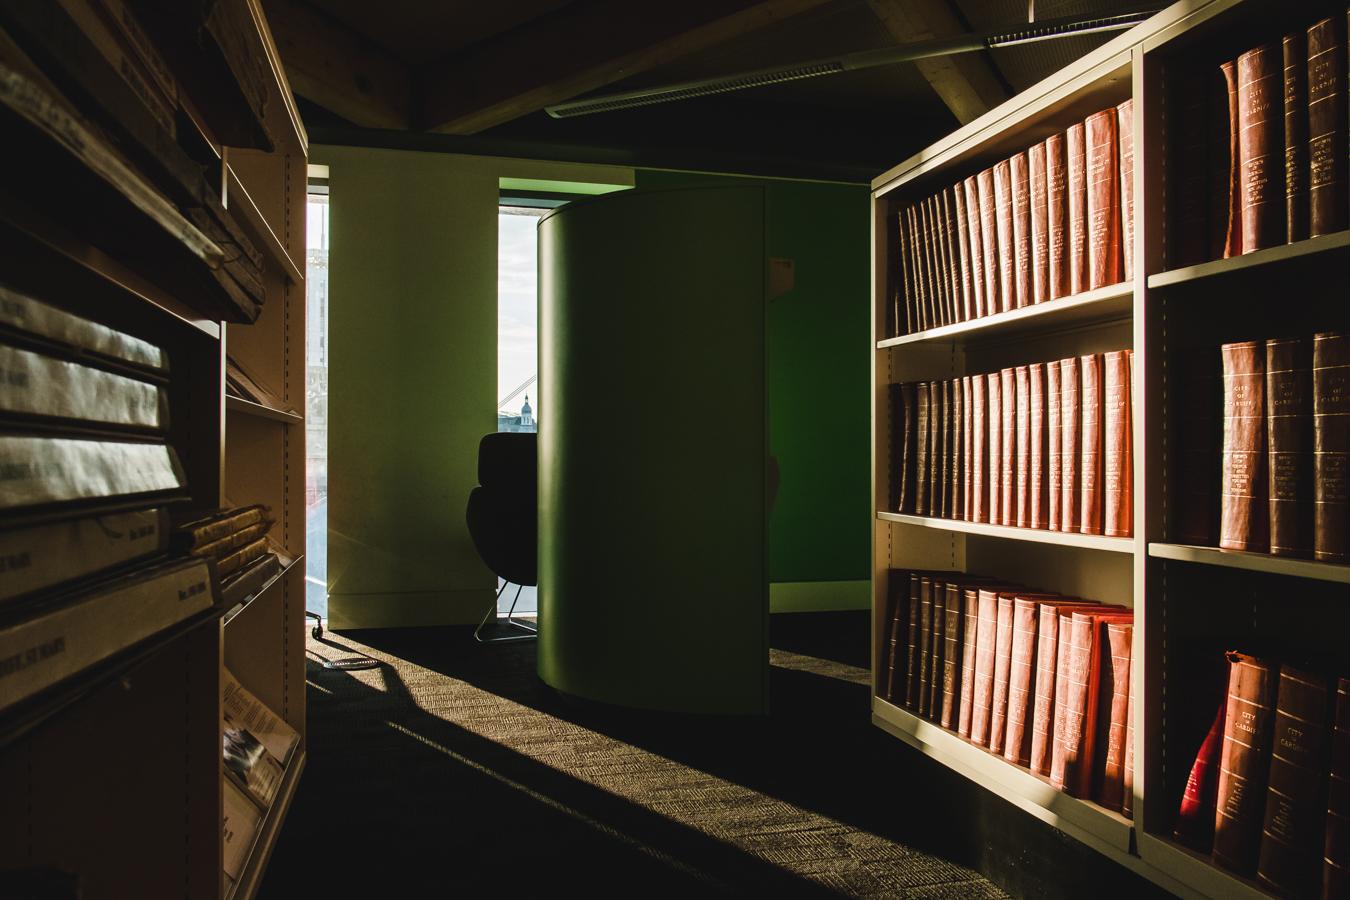 Library-8.JPG